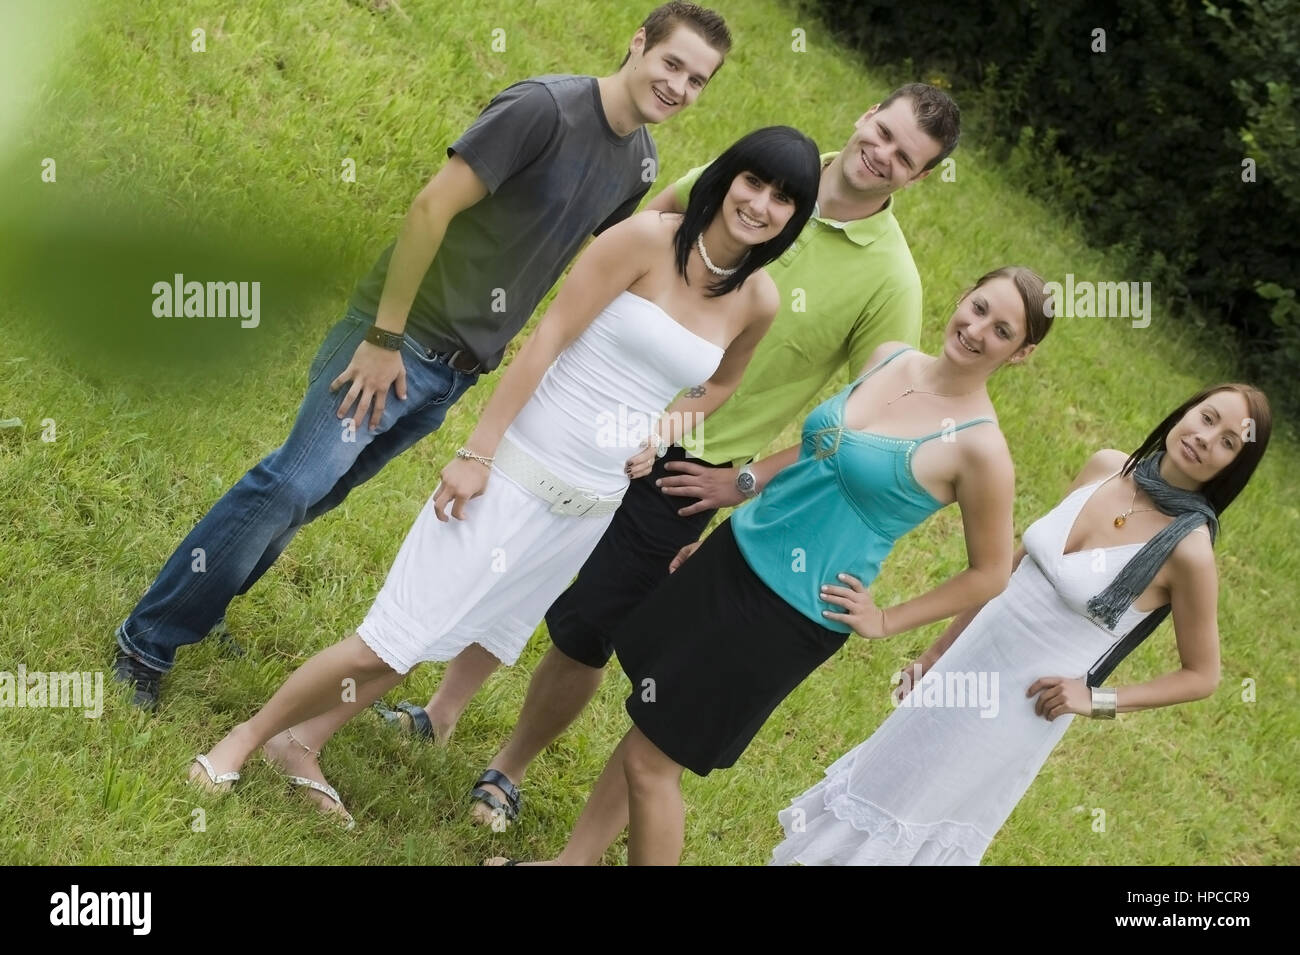 Model released , Junge Leute, 20+, in der Wiese - Young people in meadow - Stock Image